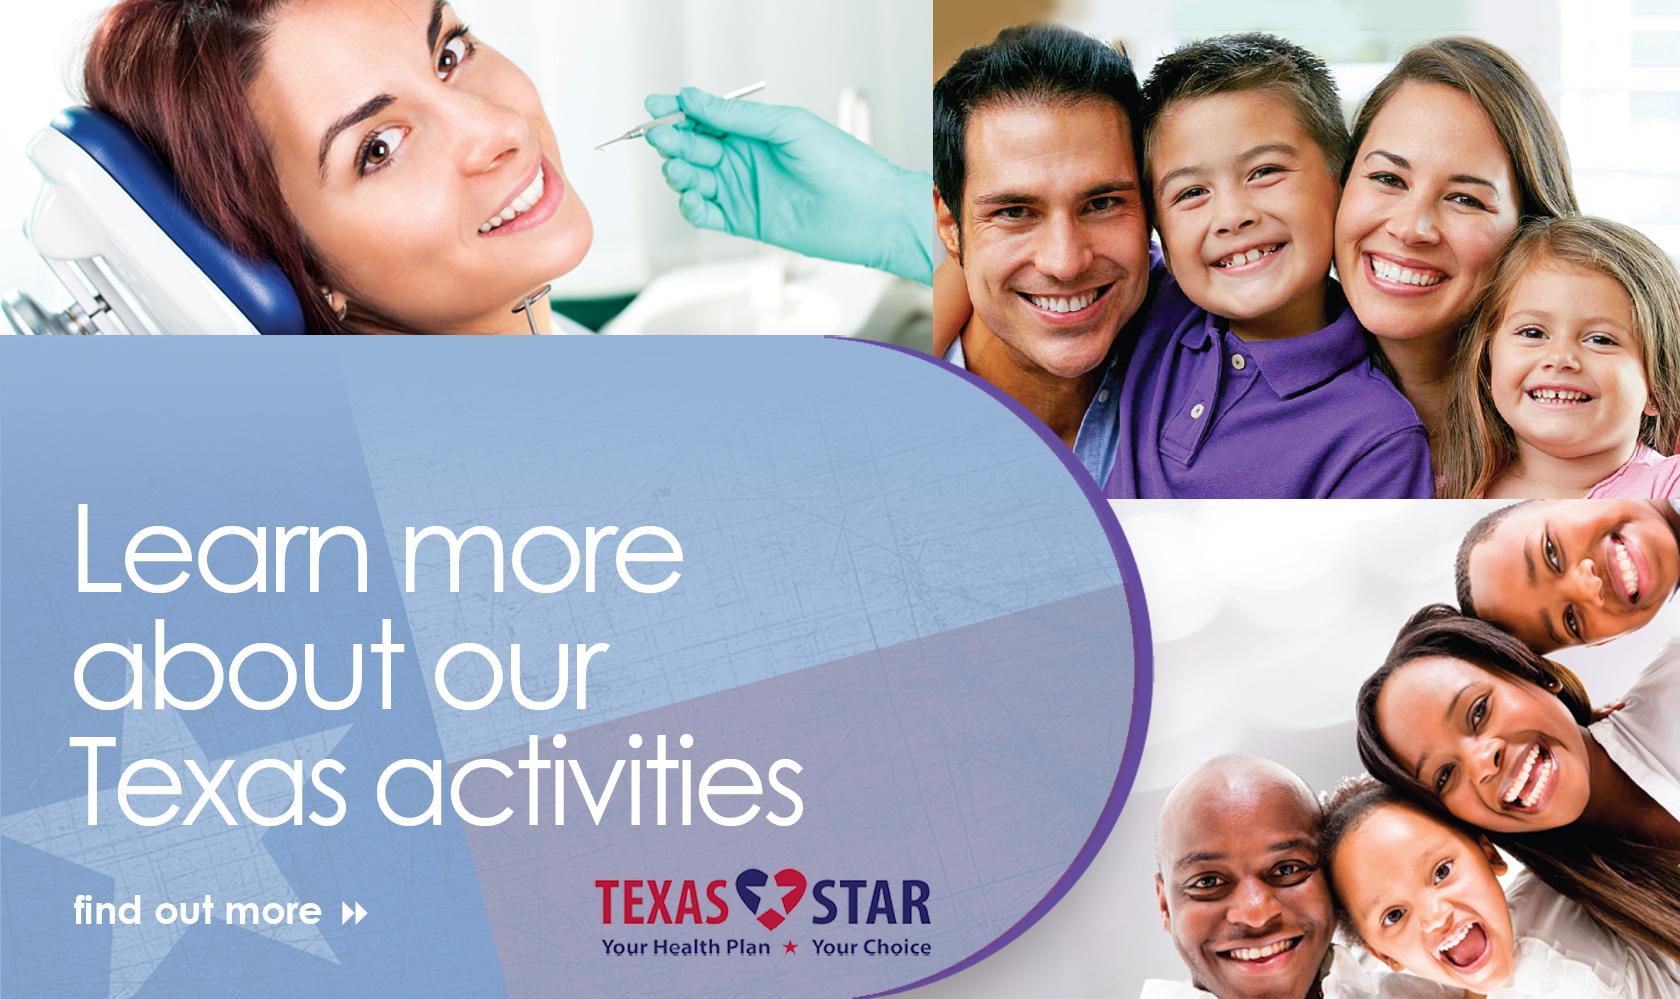 Liberty dental plan making members shine publicscrutiny Choice Image